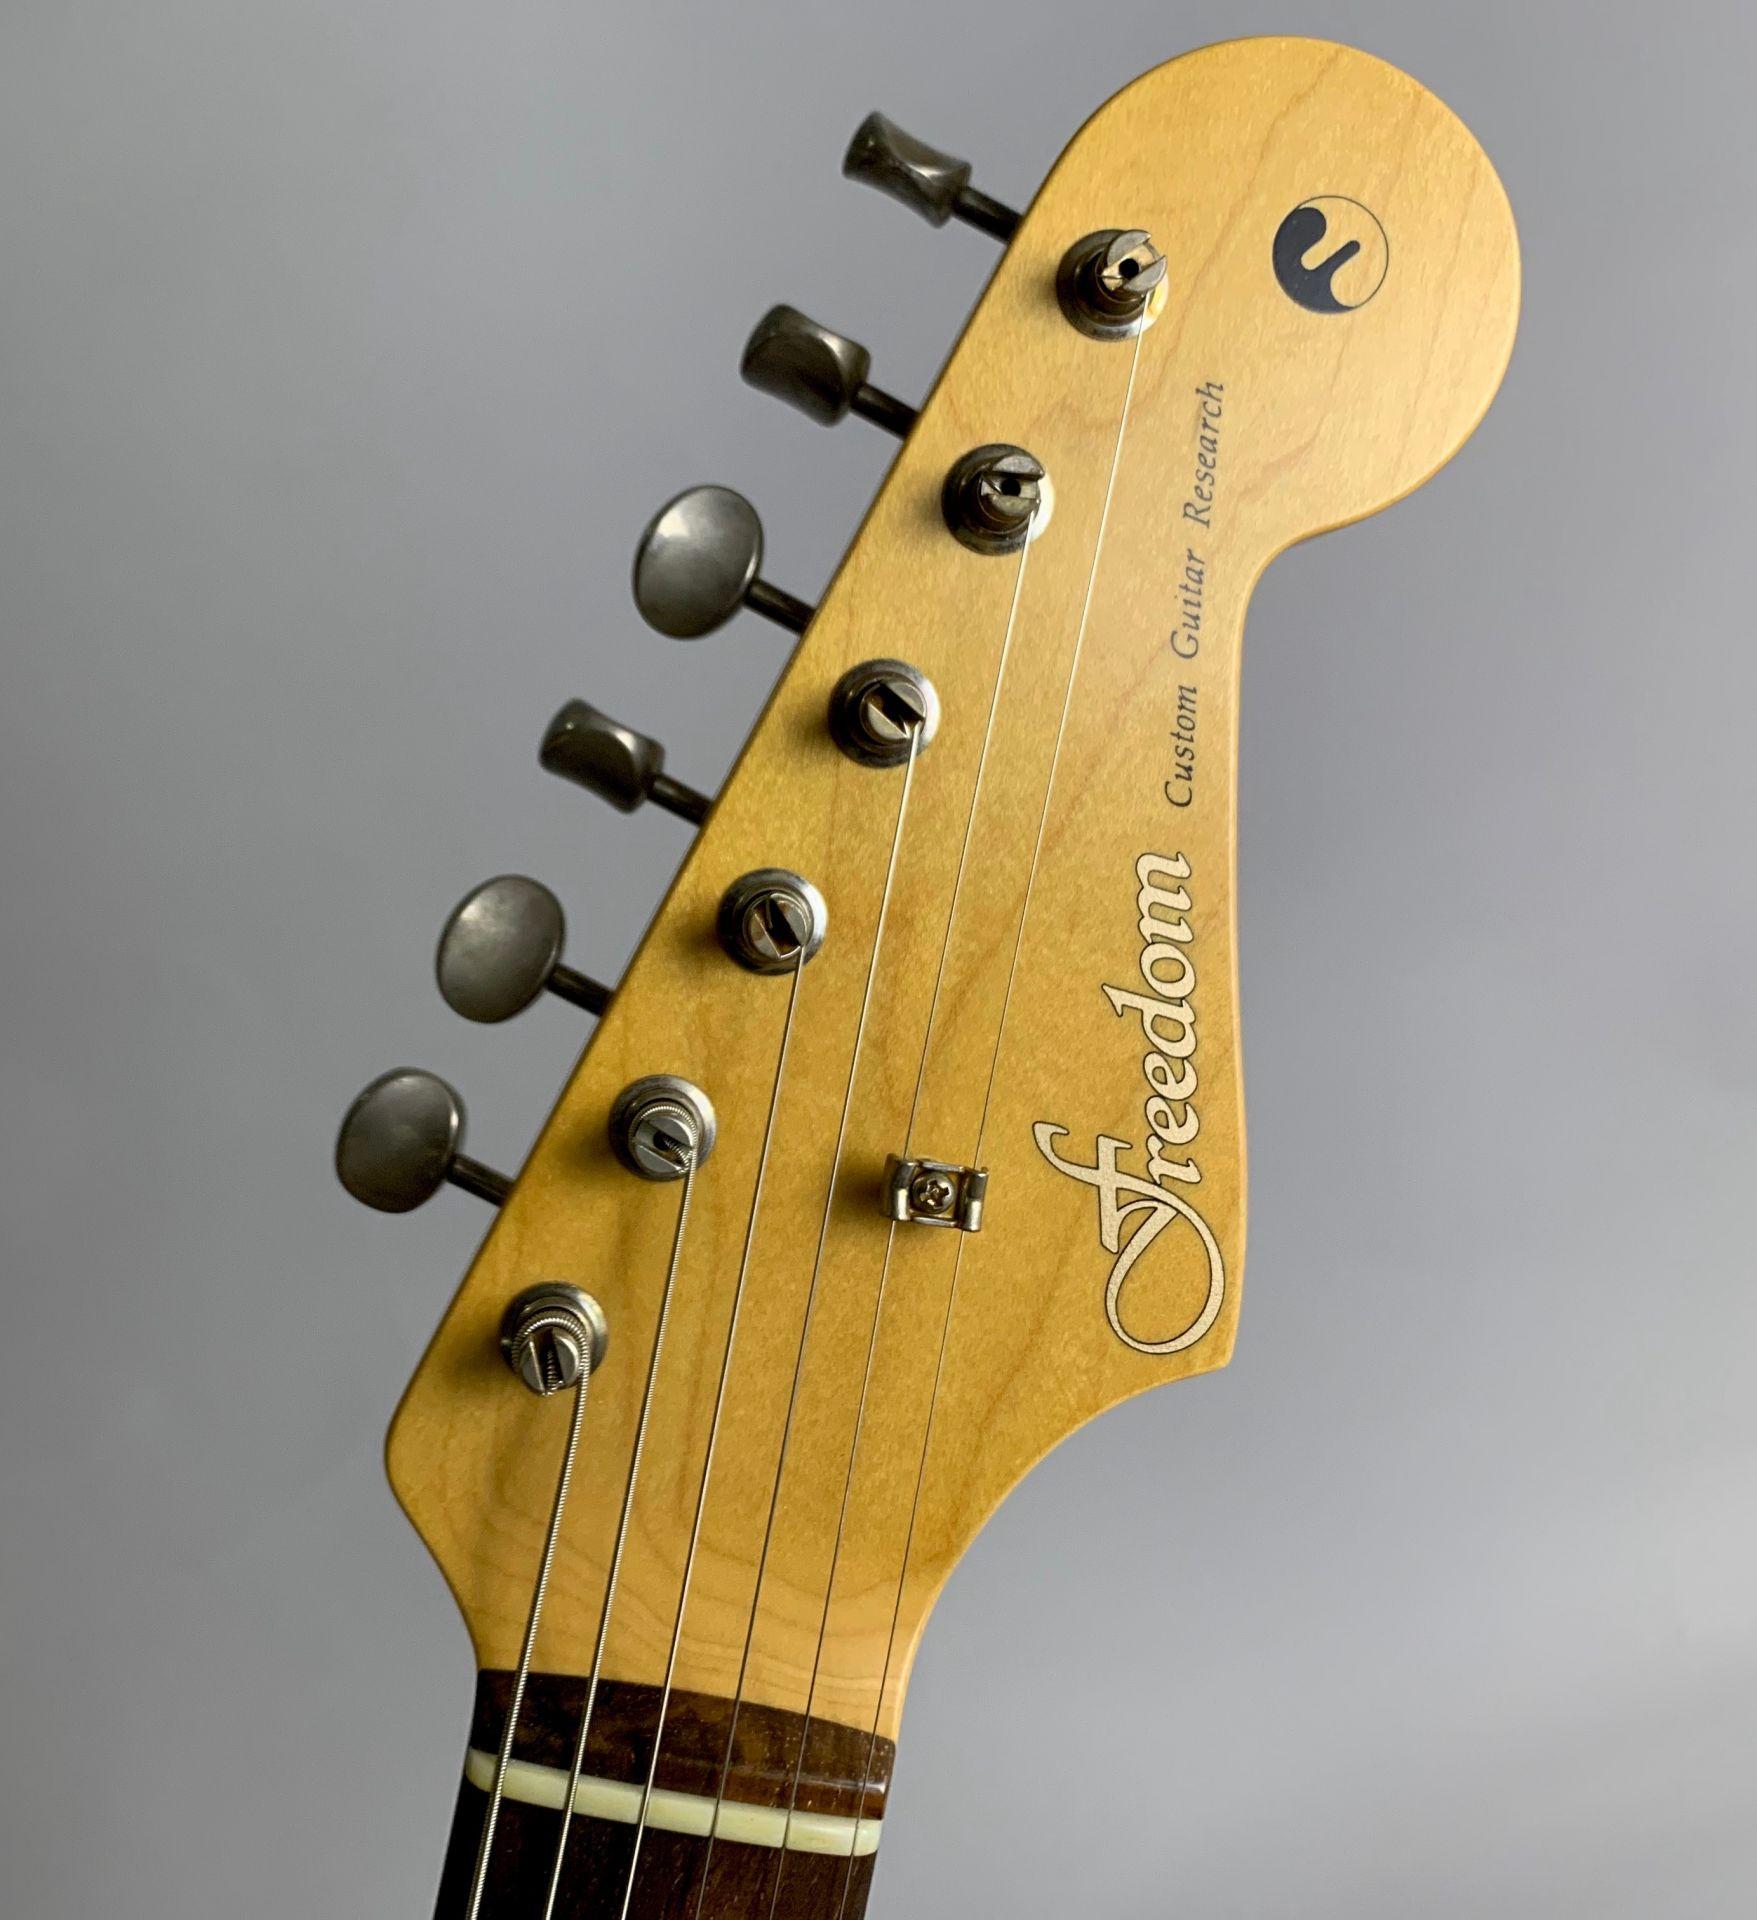 Retrospective ST Jacaranda Sonic Blue ハカランダ指板/ Playedパーツのヘッド裏-アップ画像